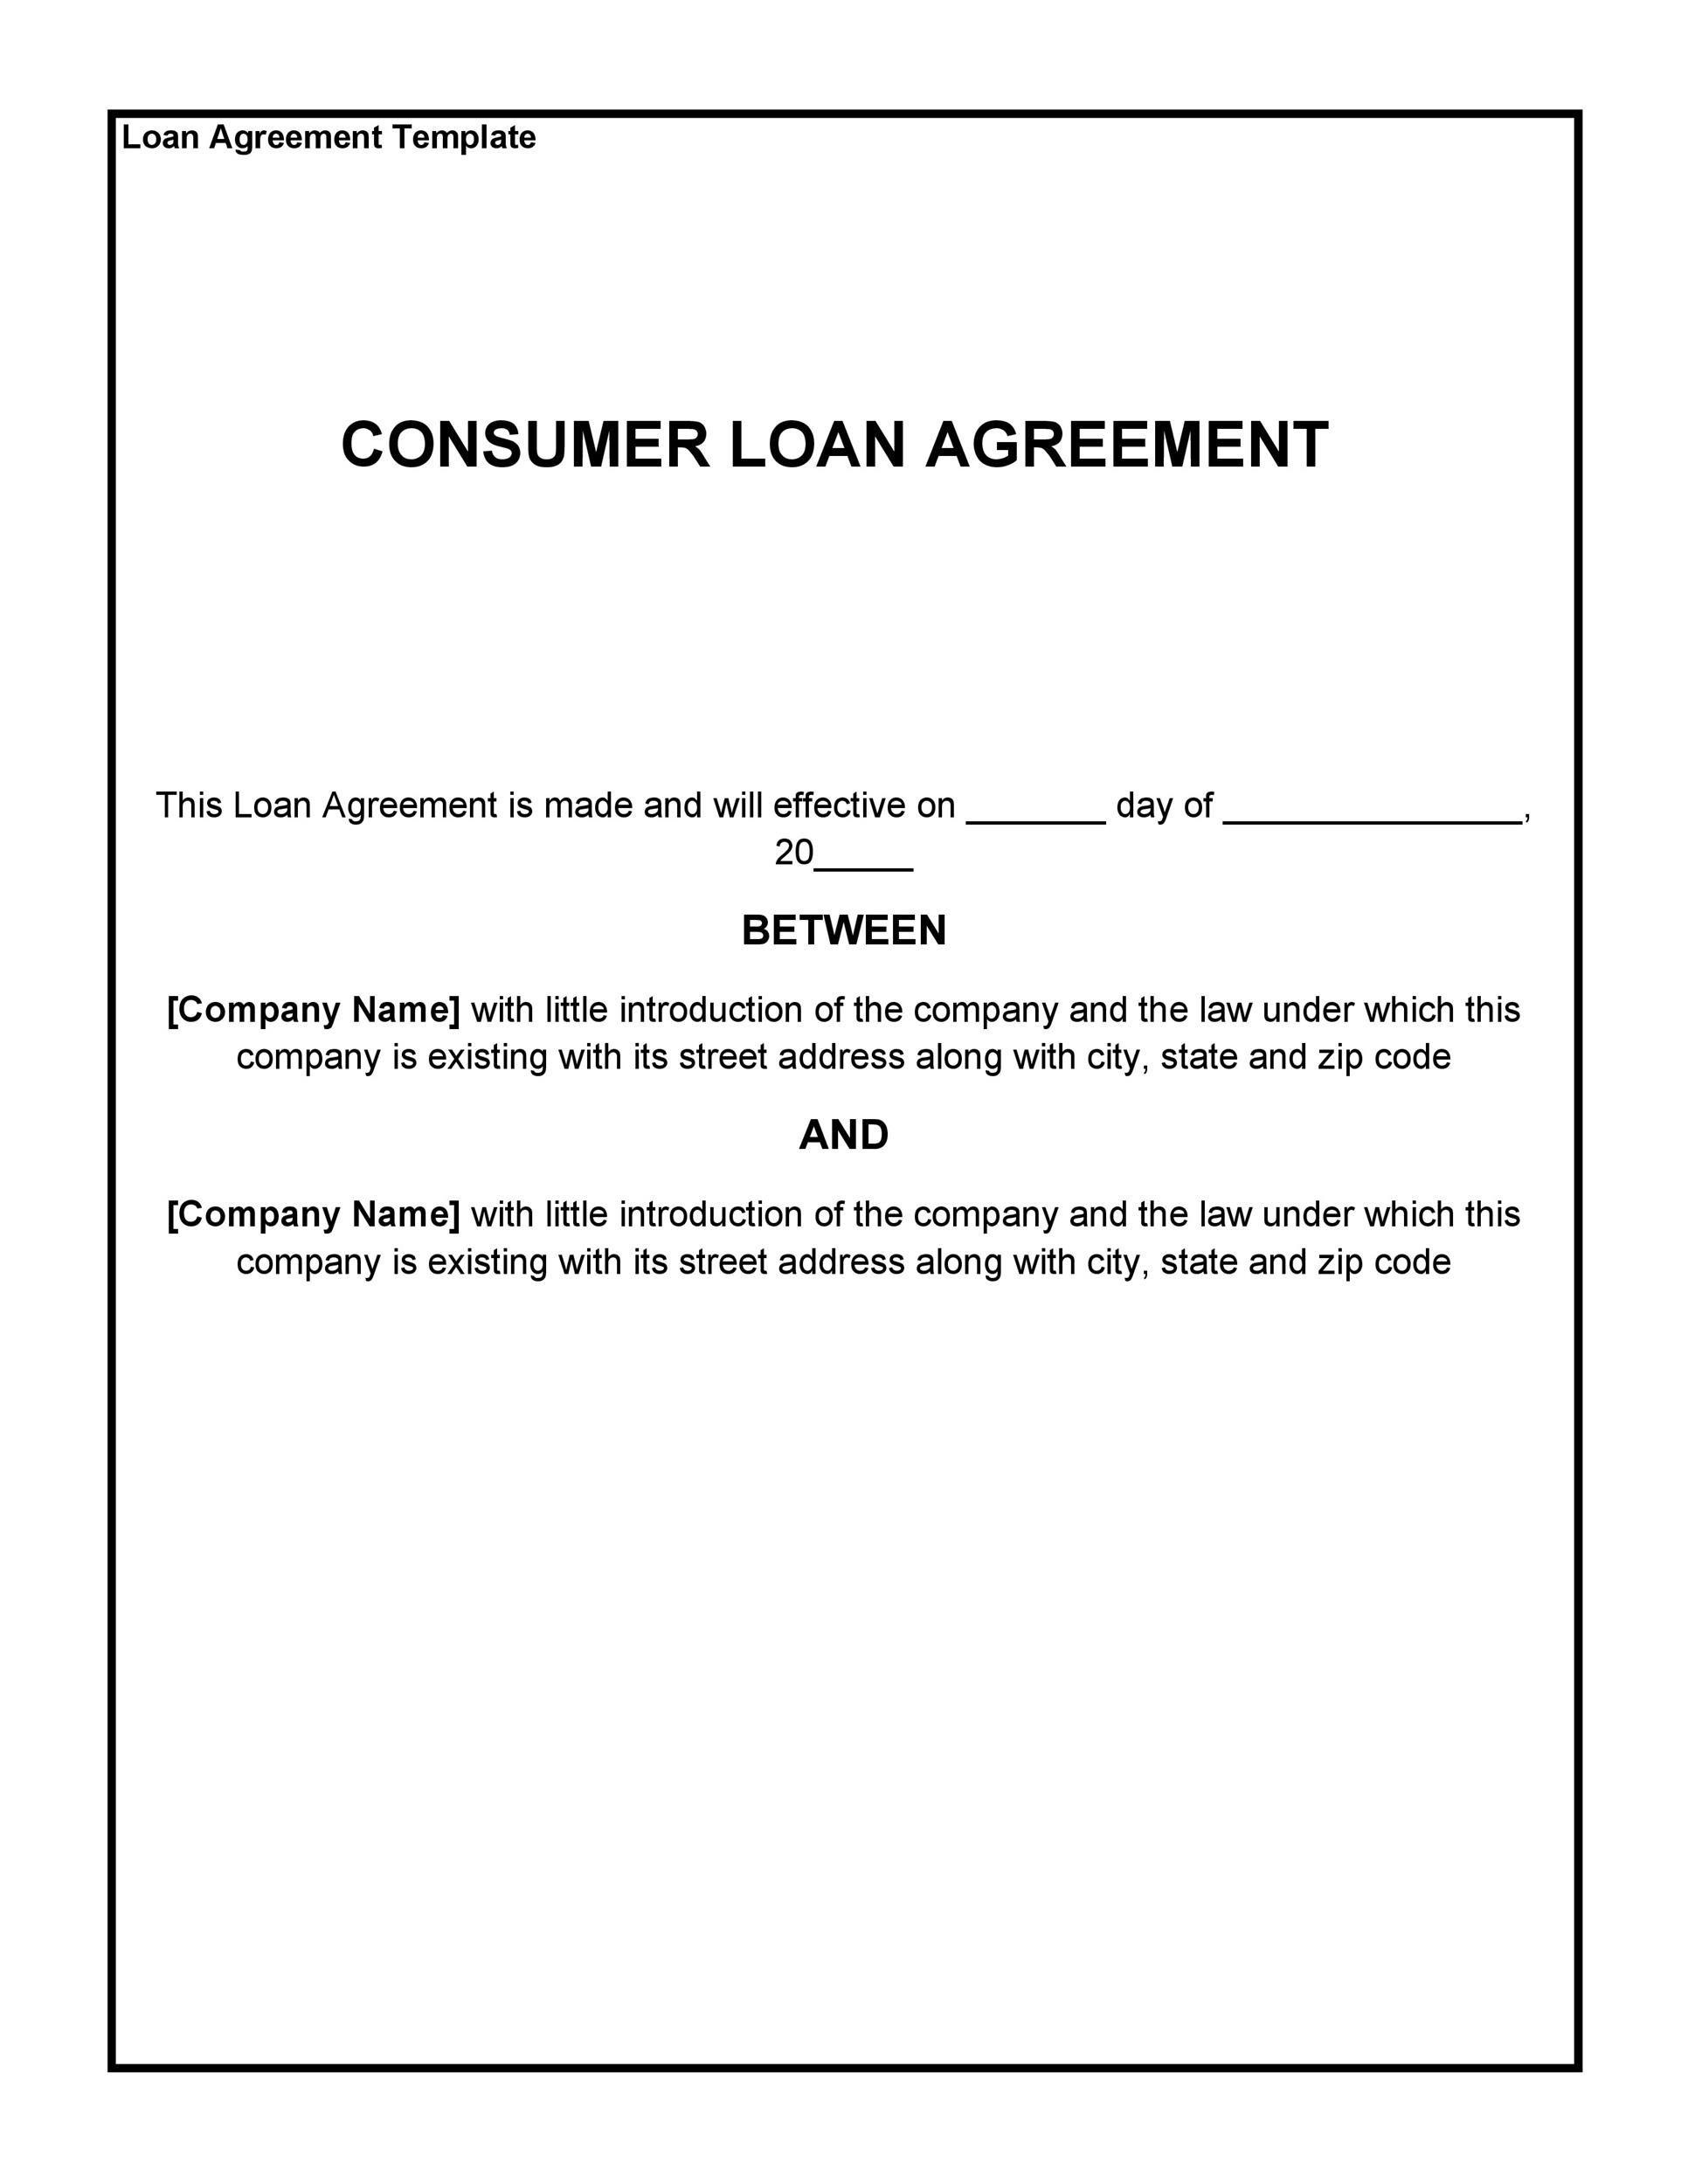 005 Dreaded Simple Loan Agreement Template Word Photo  Format Personal MicrosoftFull